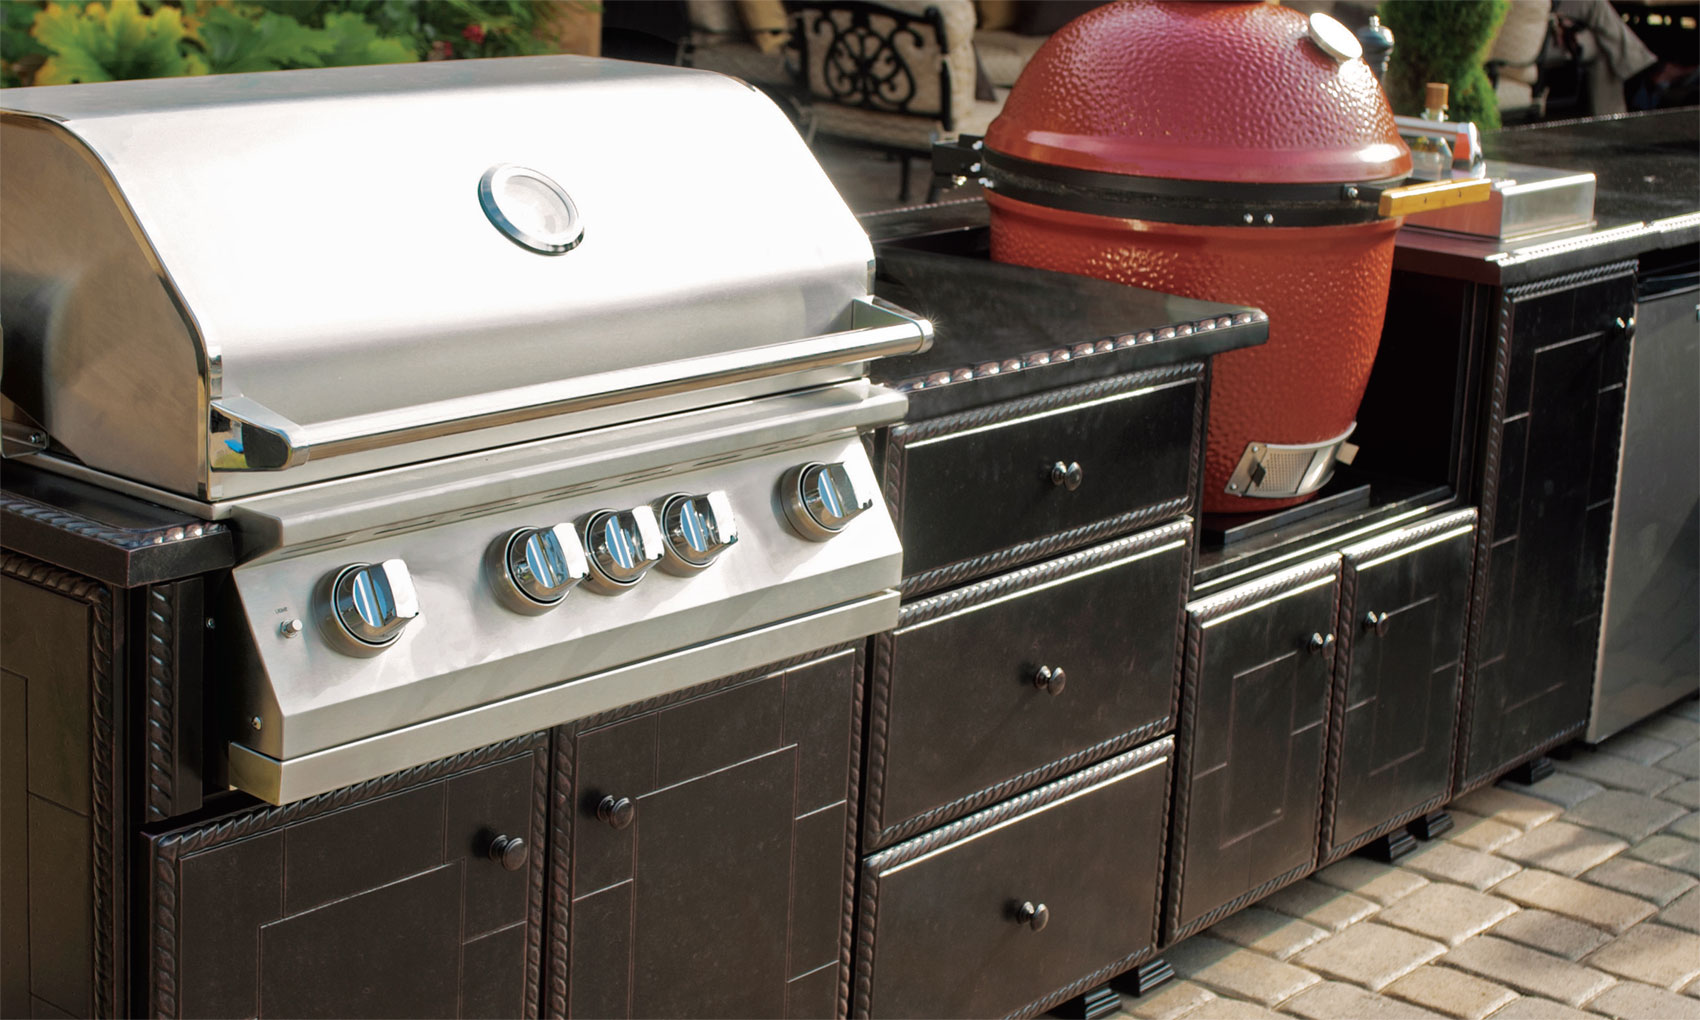 Outdoor Kitchens Appliance Storage Cabinets